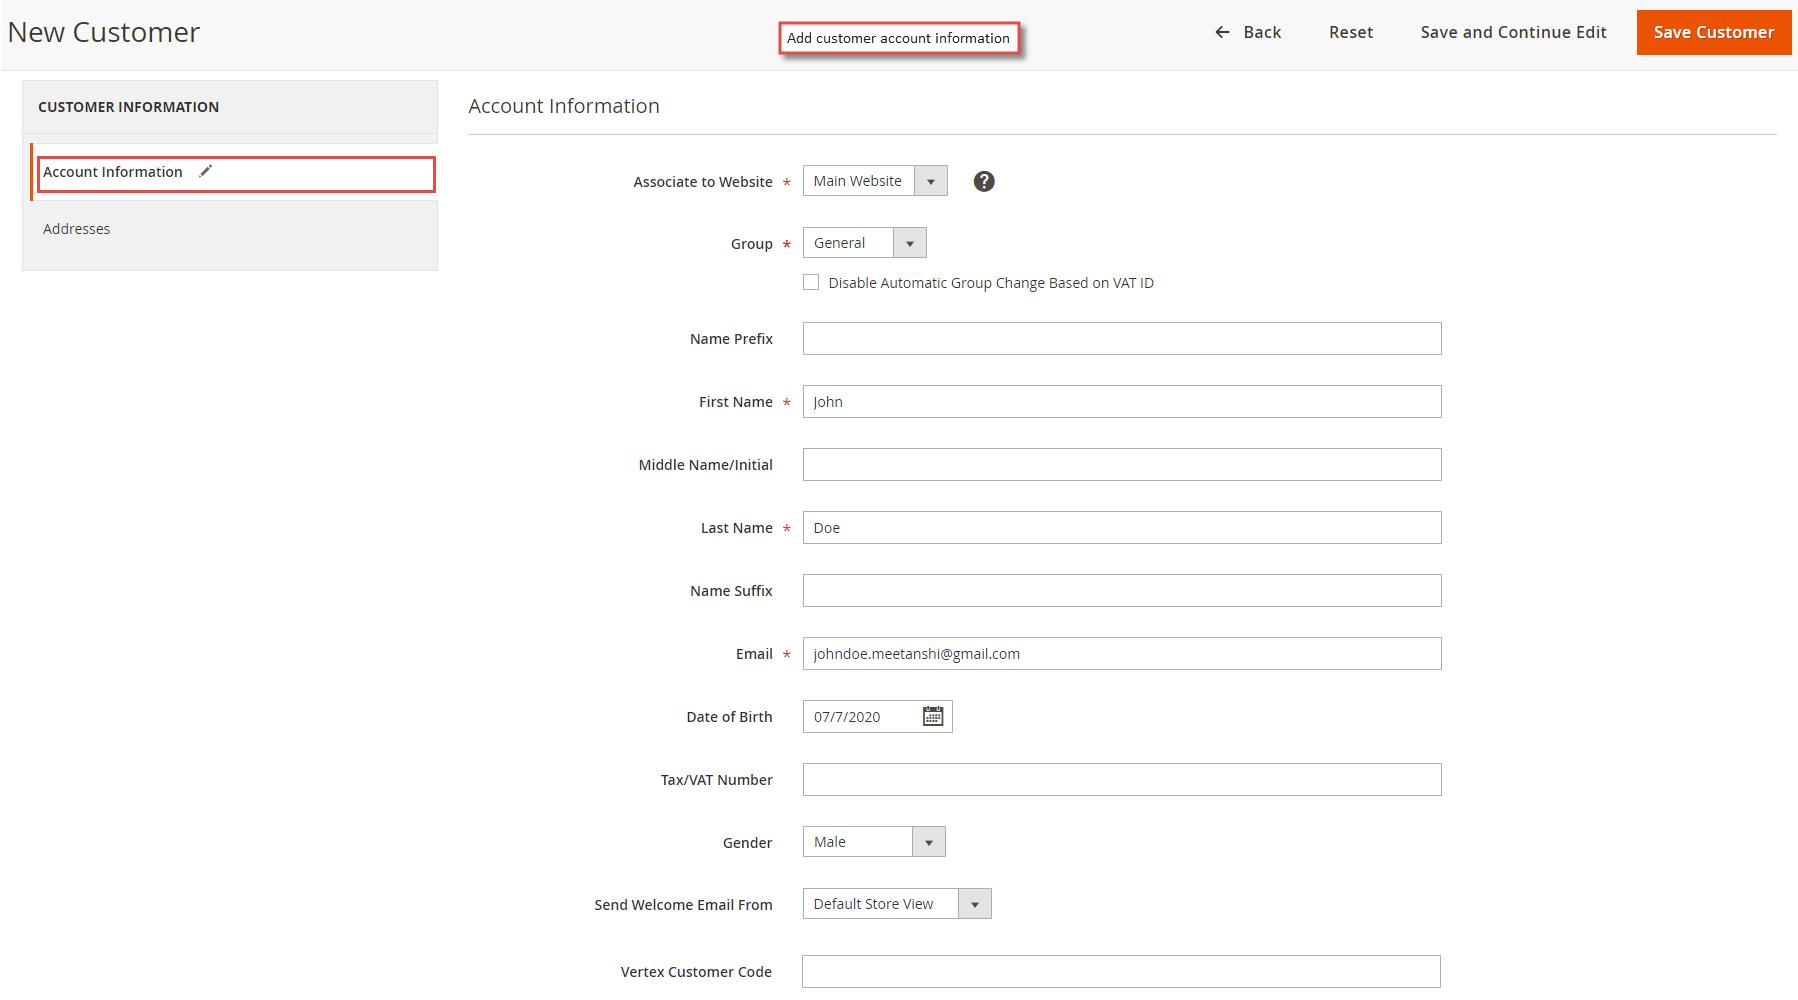 Add customer account information